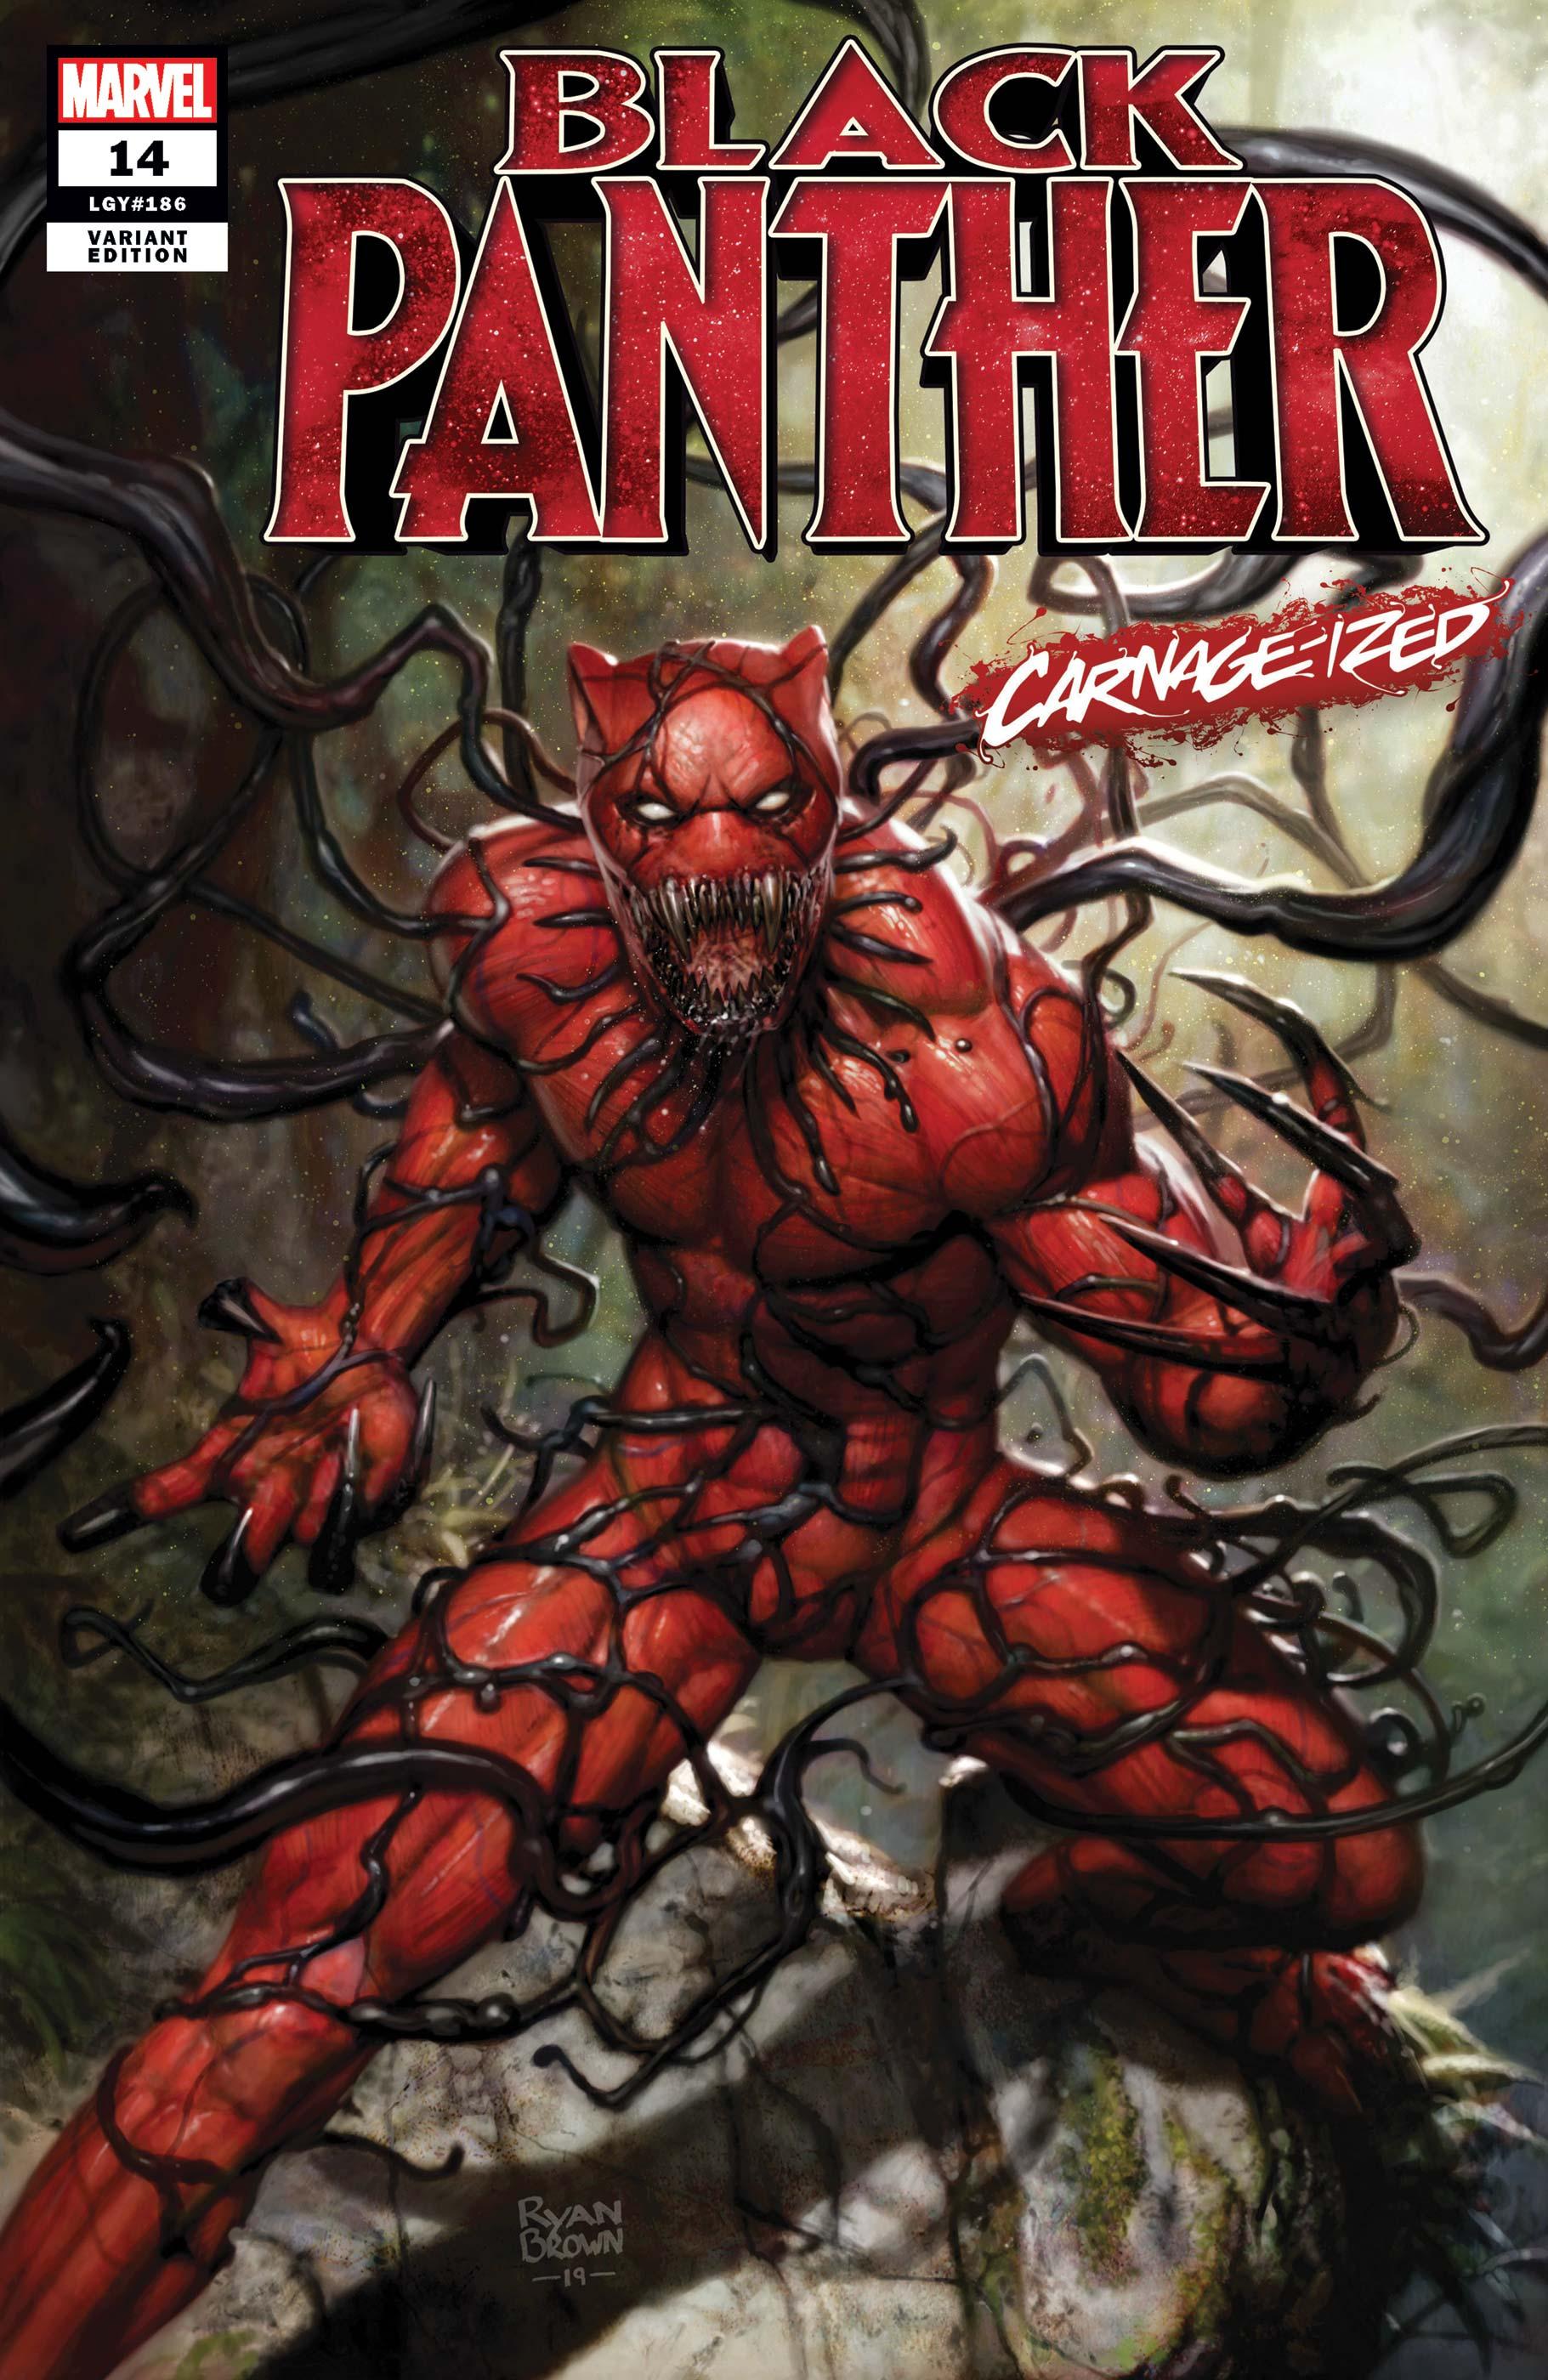 Black Panther (2018) #14 (Variant)